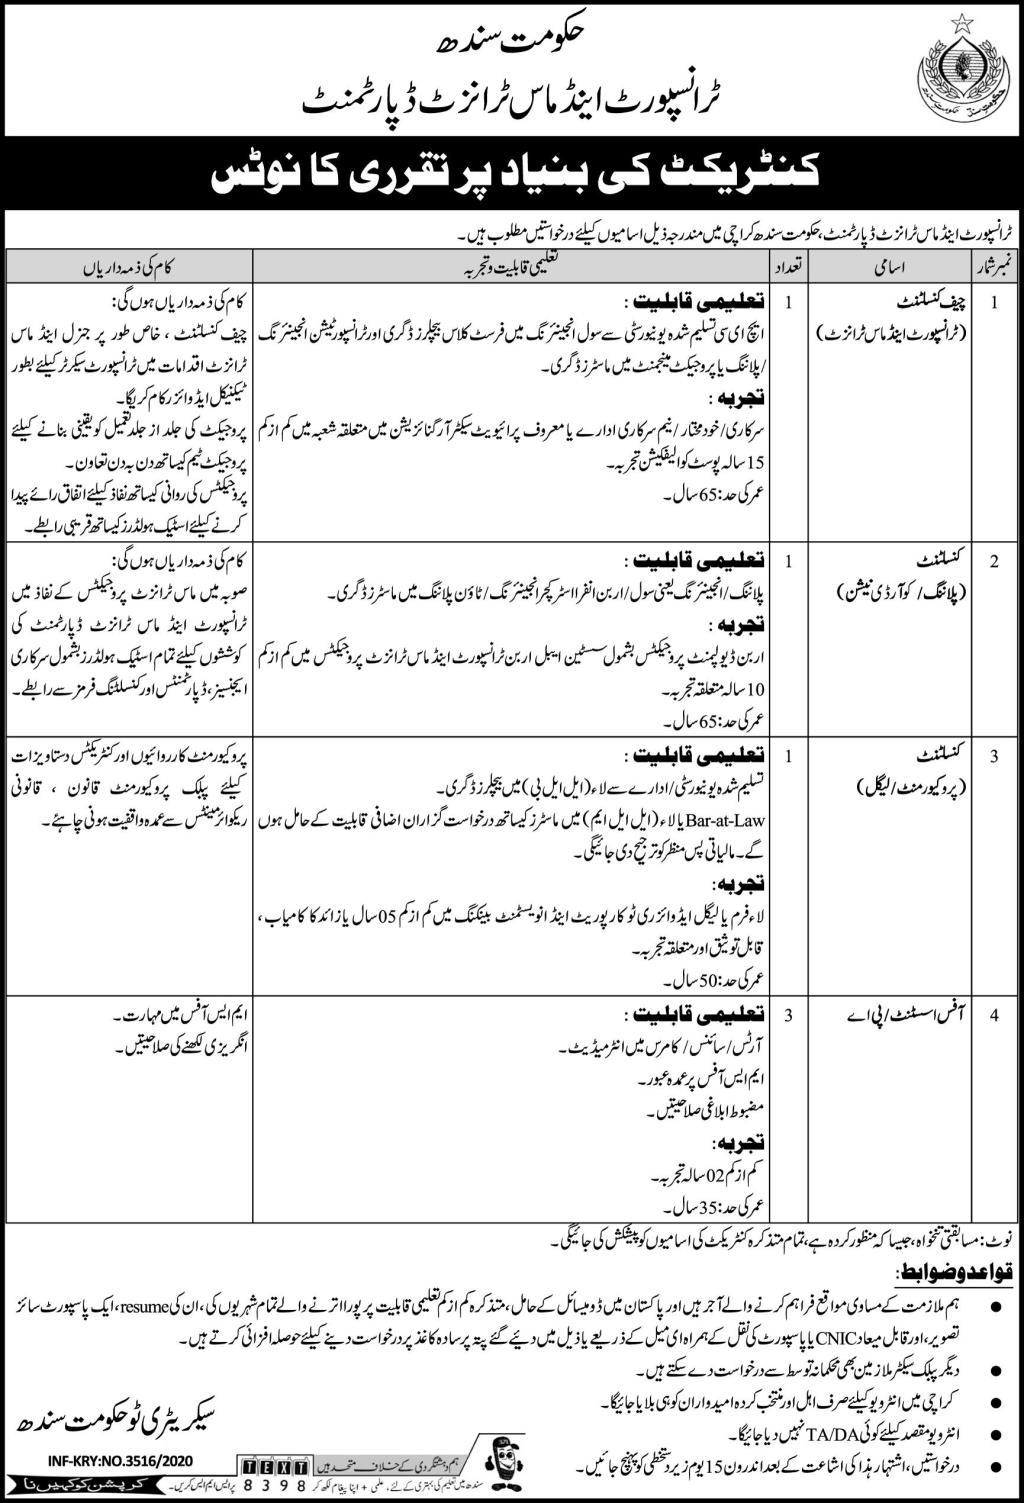 Transport & Mass Transit Department Jobs 2020 in Karachi